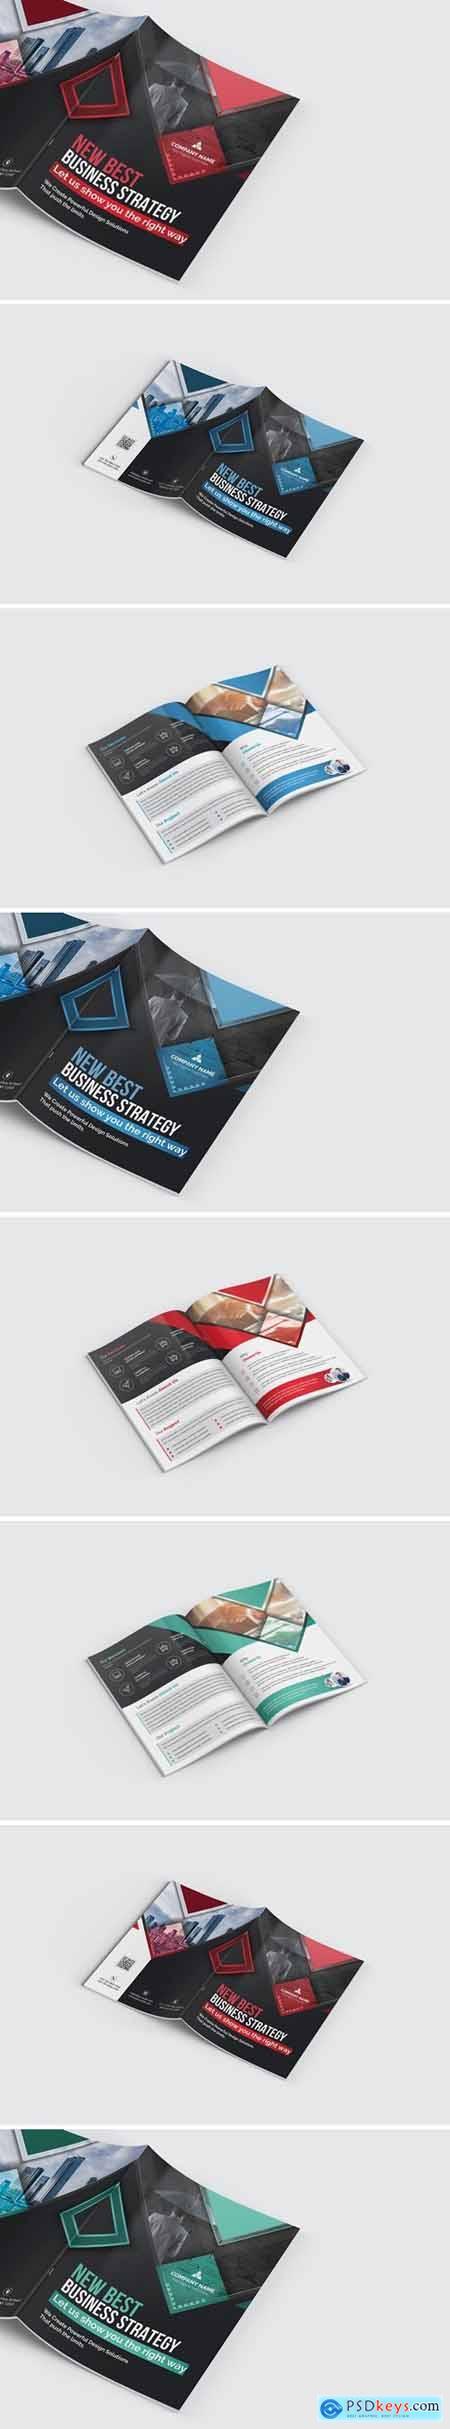 Bifold Brochure JJNJ6JY